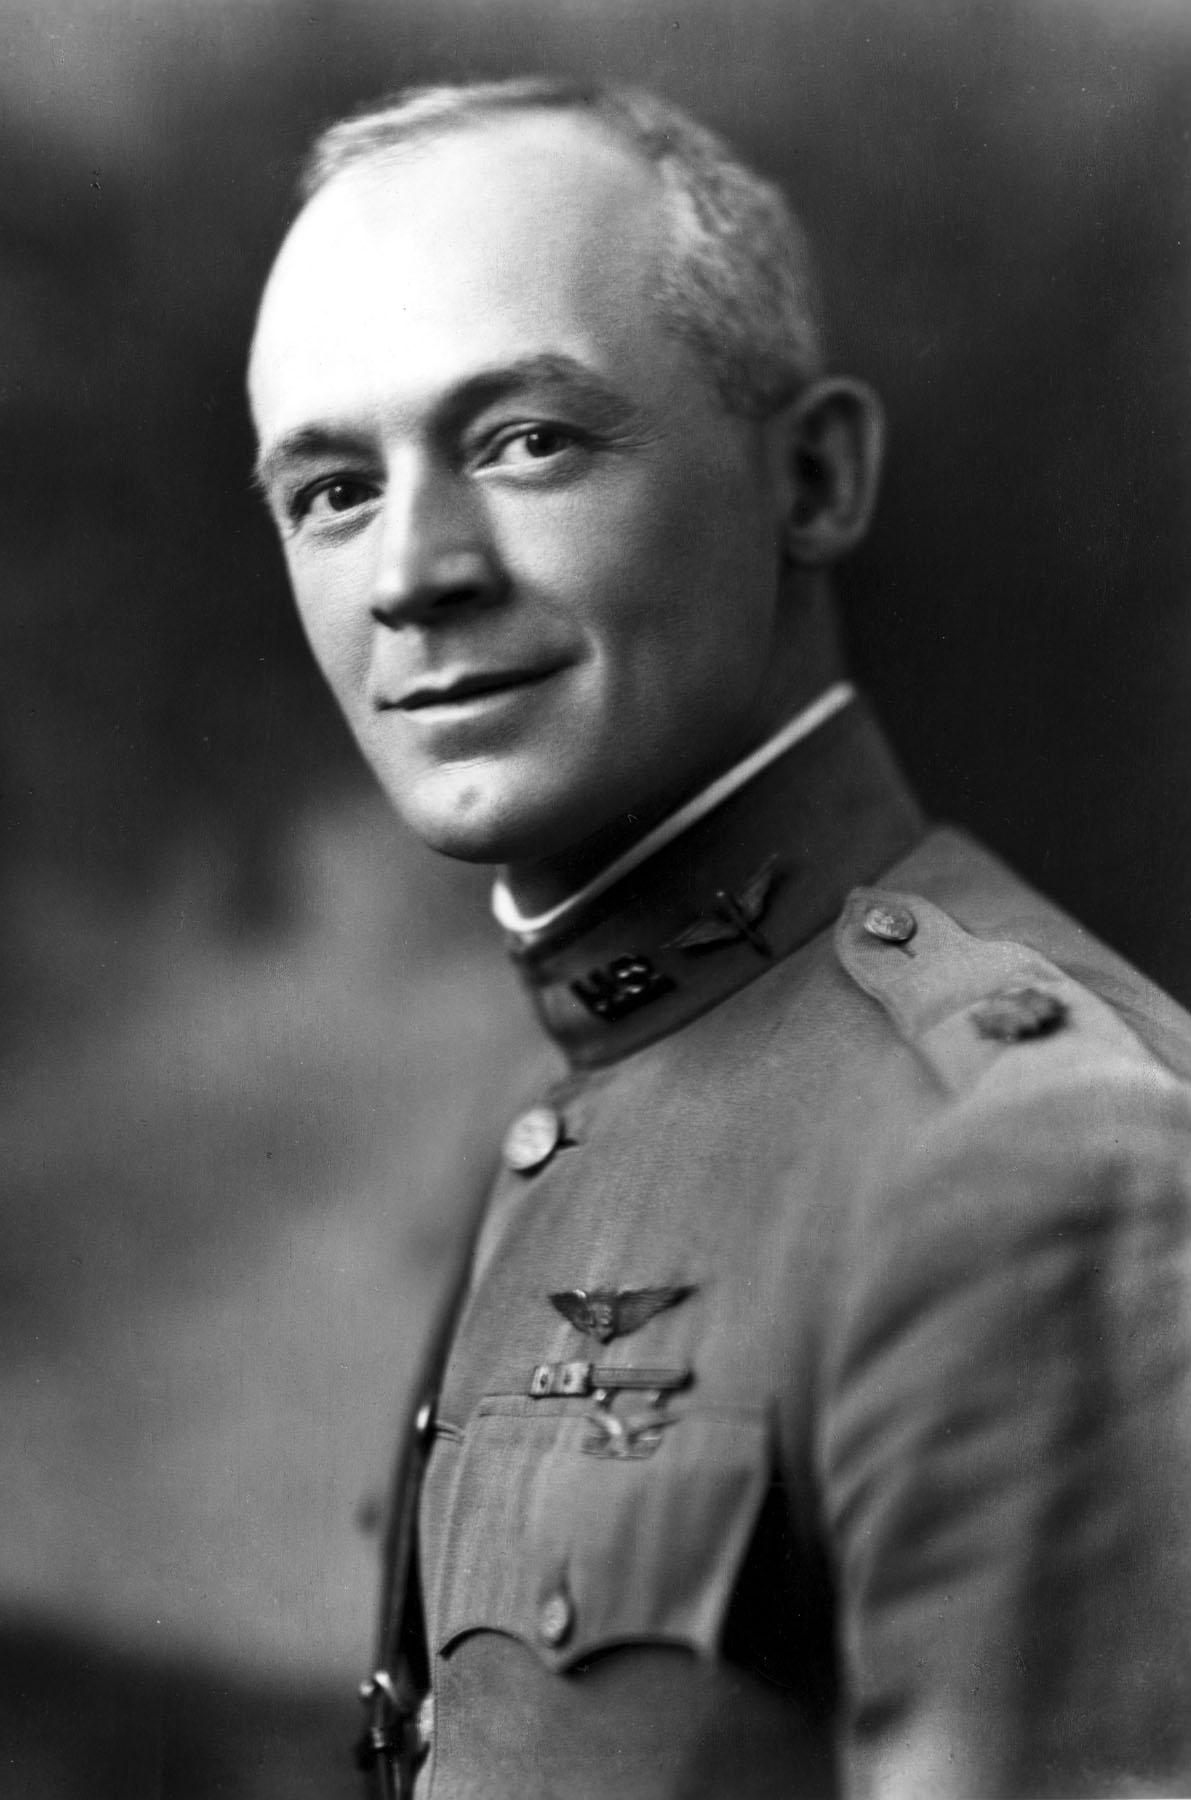 Col. Henry H. Arnold